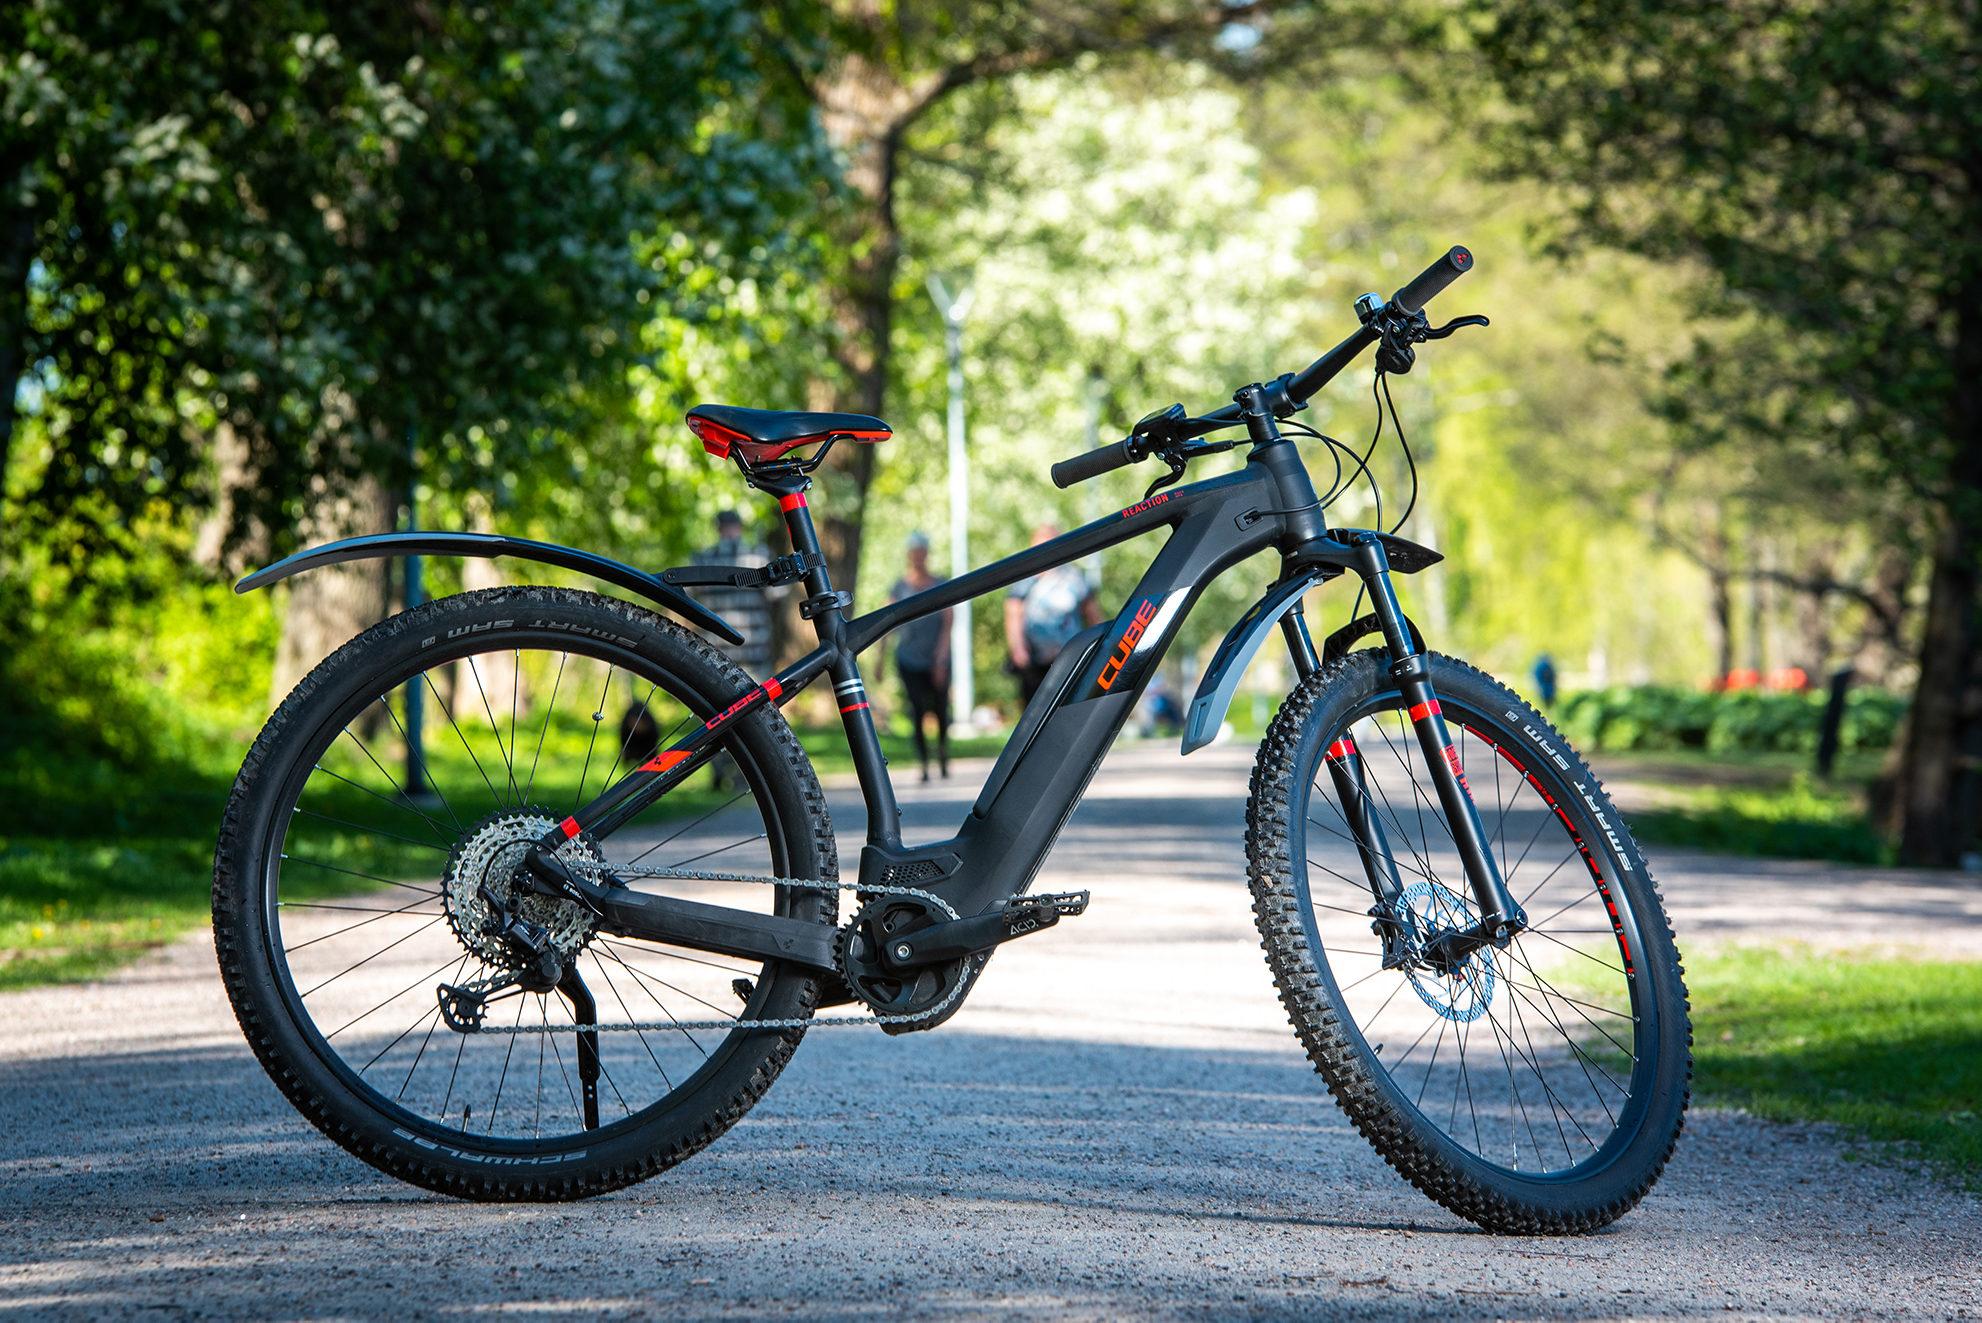 CUBE NUTRAIL 2020 -size  M-17``- Biker 165-178cm